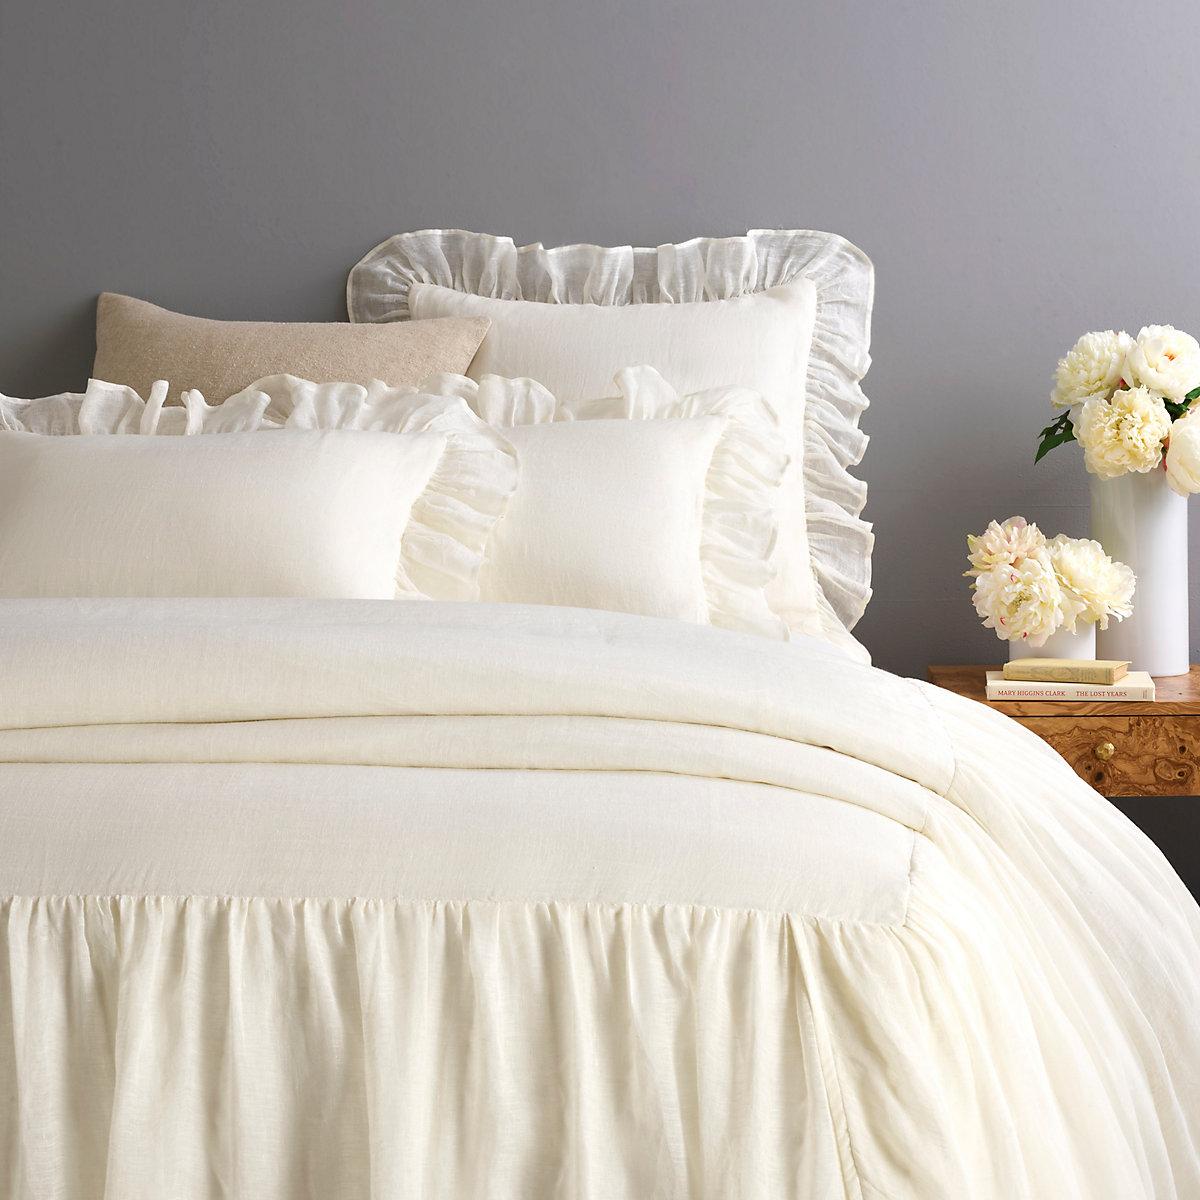 Savannah Linen Gauze Ivory Bedspread Pine Cone Hill